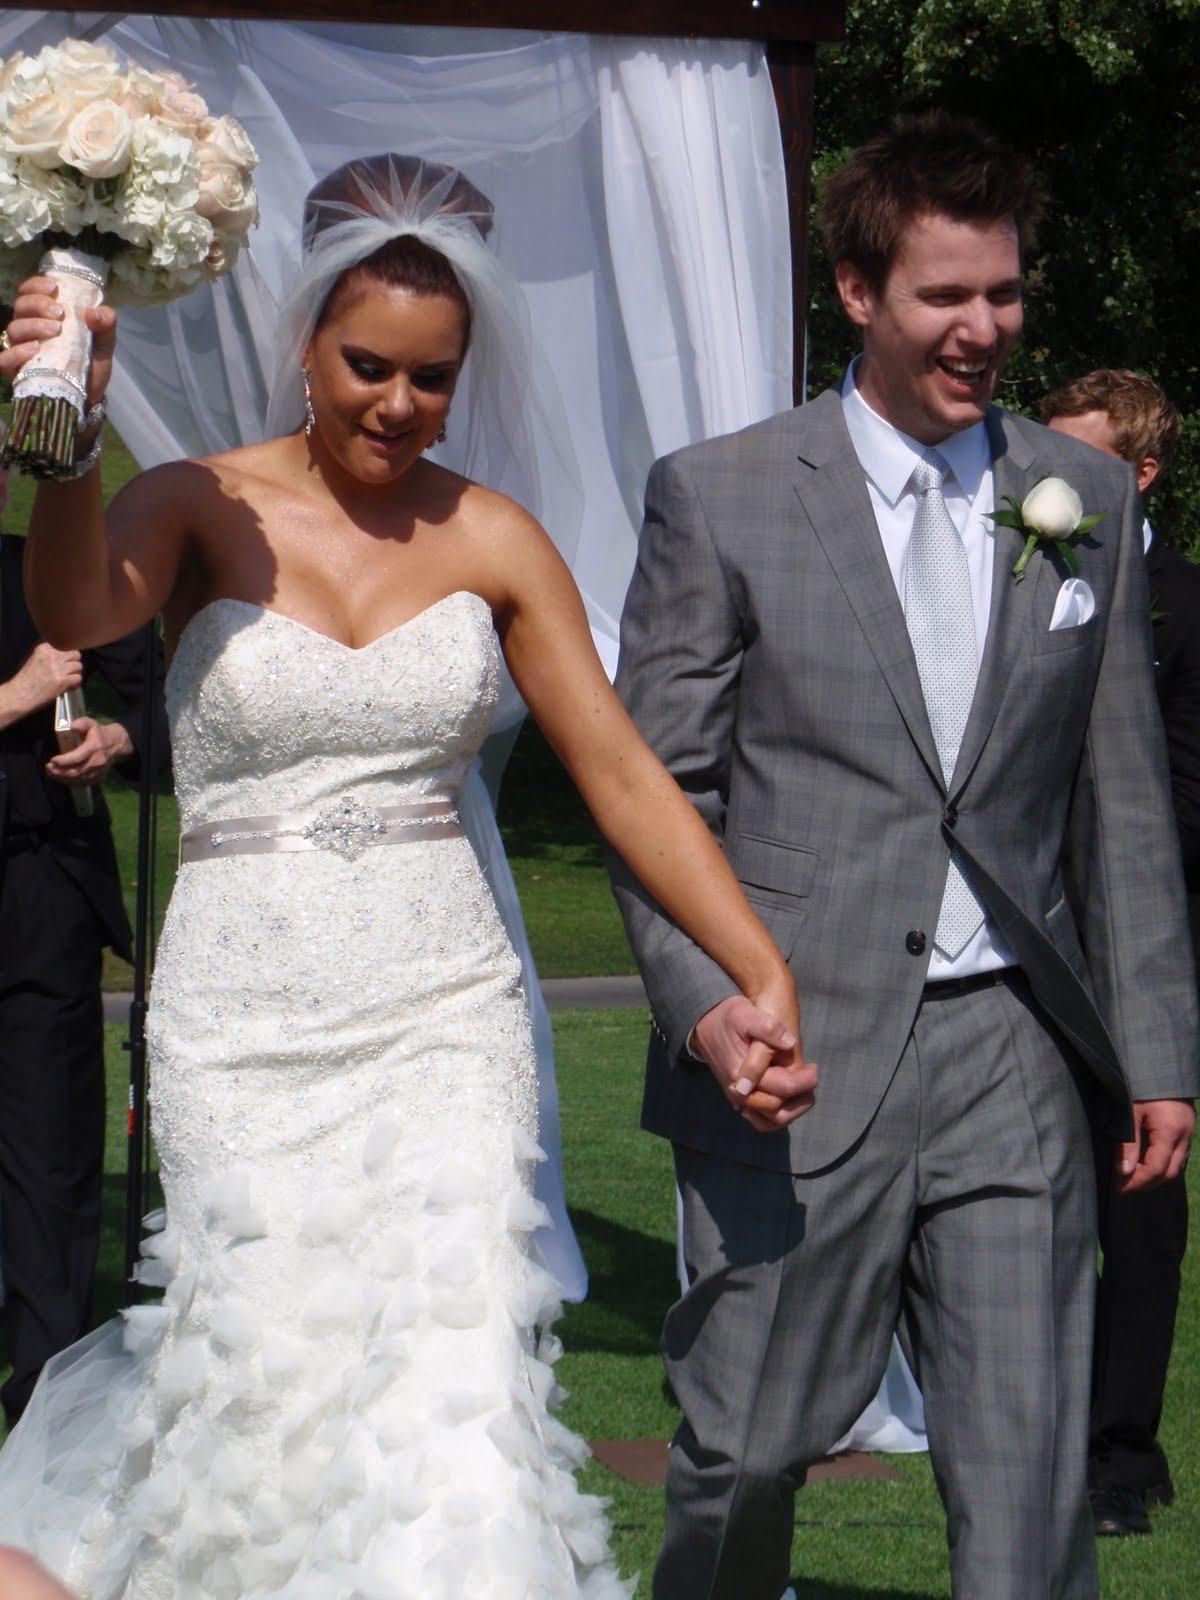 Brent Seabrook Wedding | www.imgkid.com - The Image Kid ...